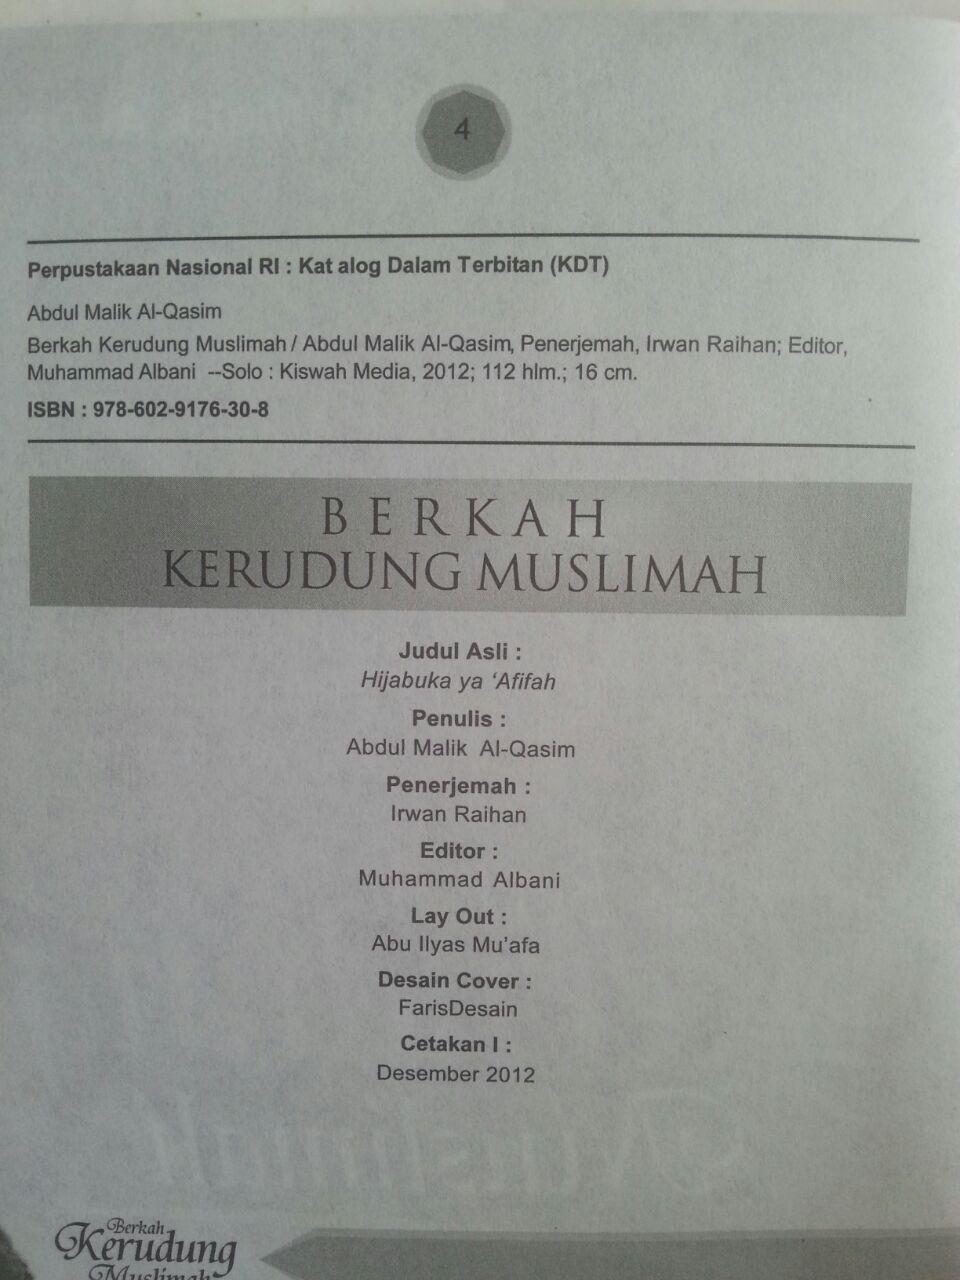 Buku Berkah Kerudung Muslimah Beragam Manfaat Berjilbab isi 2